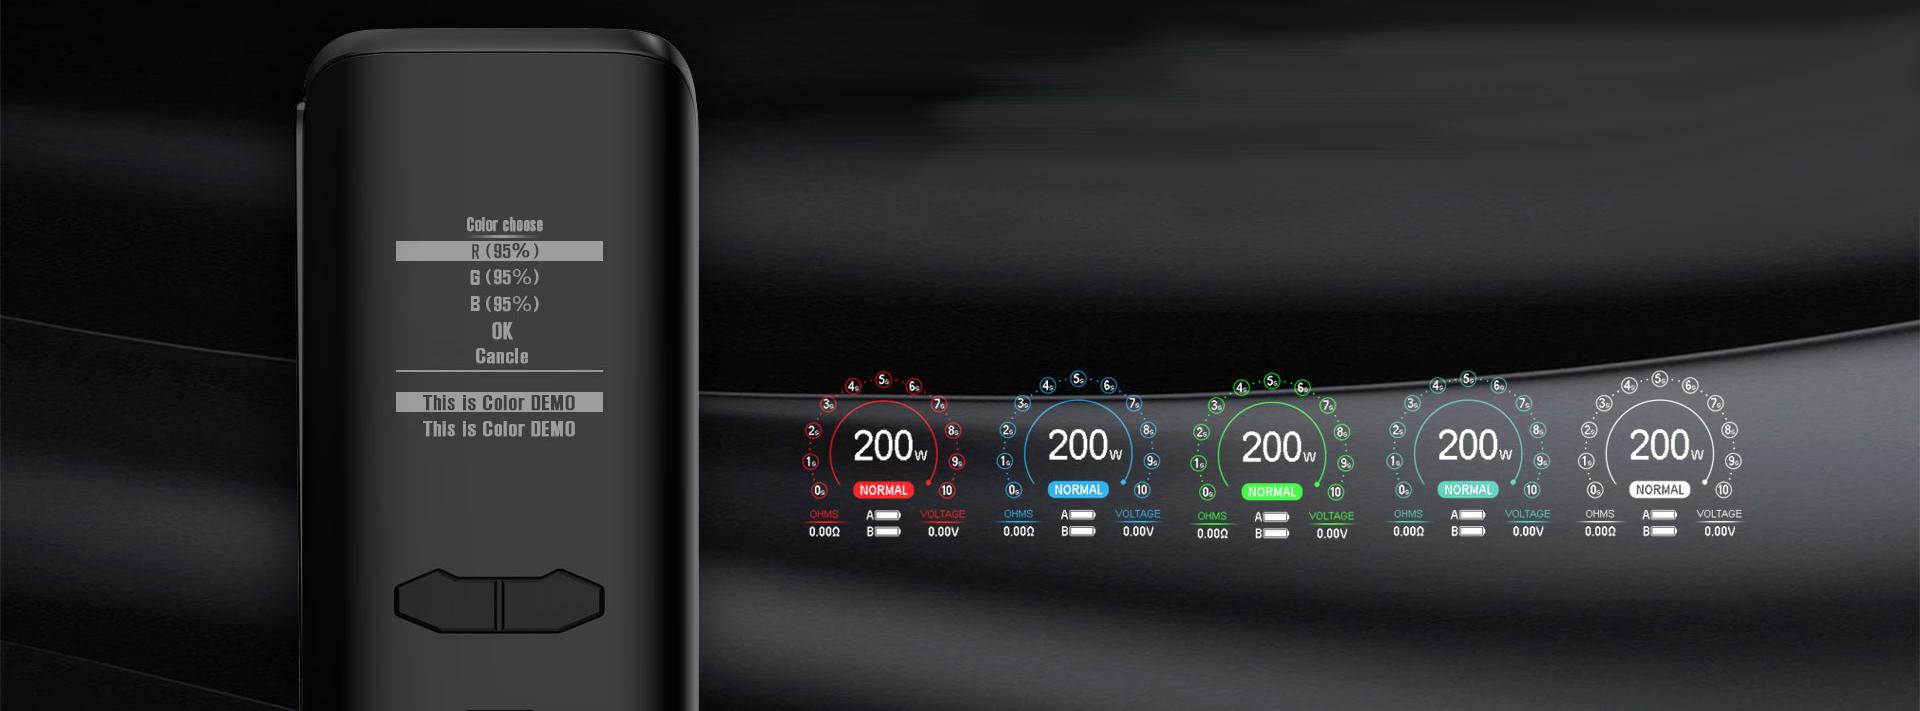 Augvape VX200 mod, έγχρωμη οθονη 1,3 ιντσων.